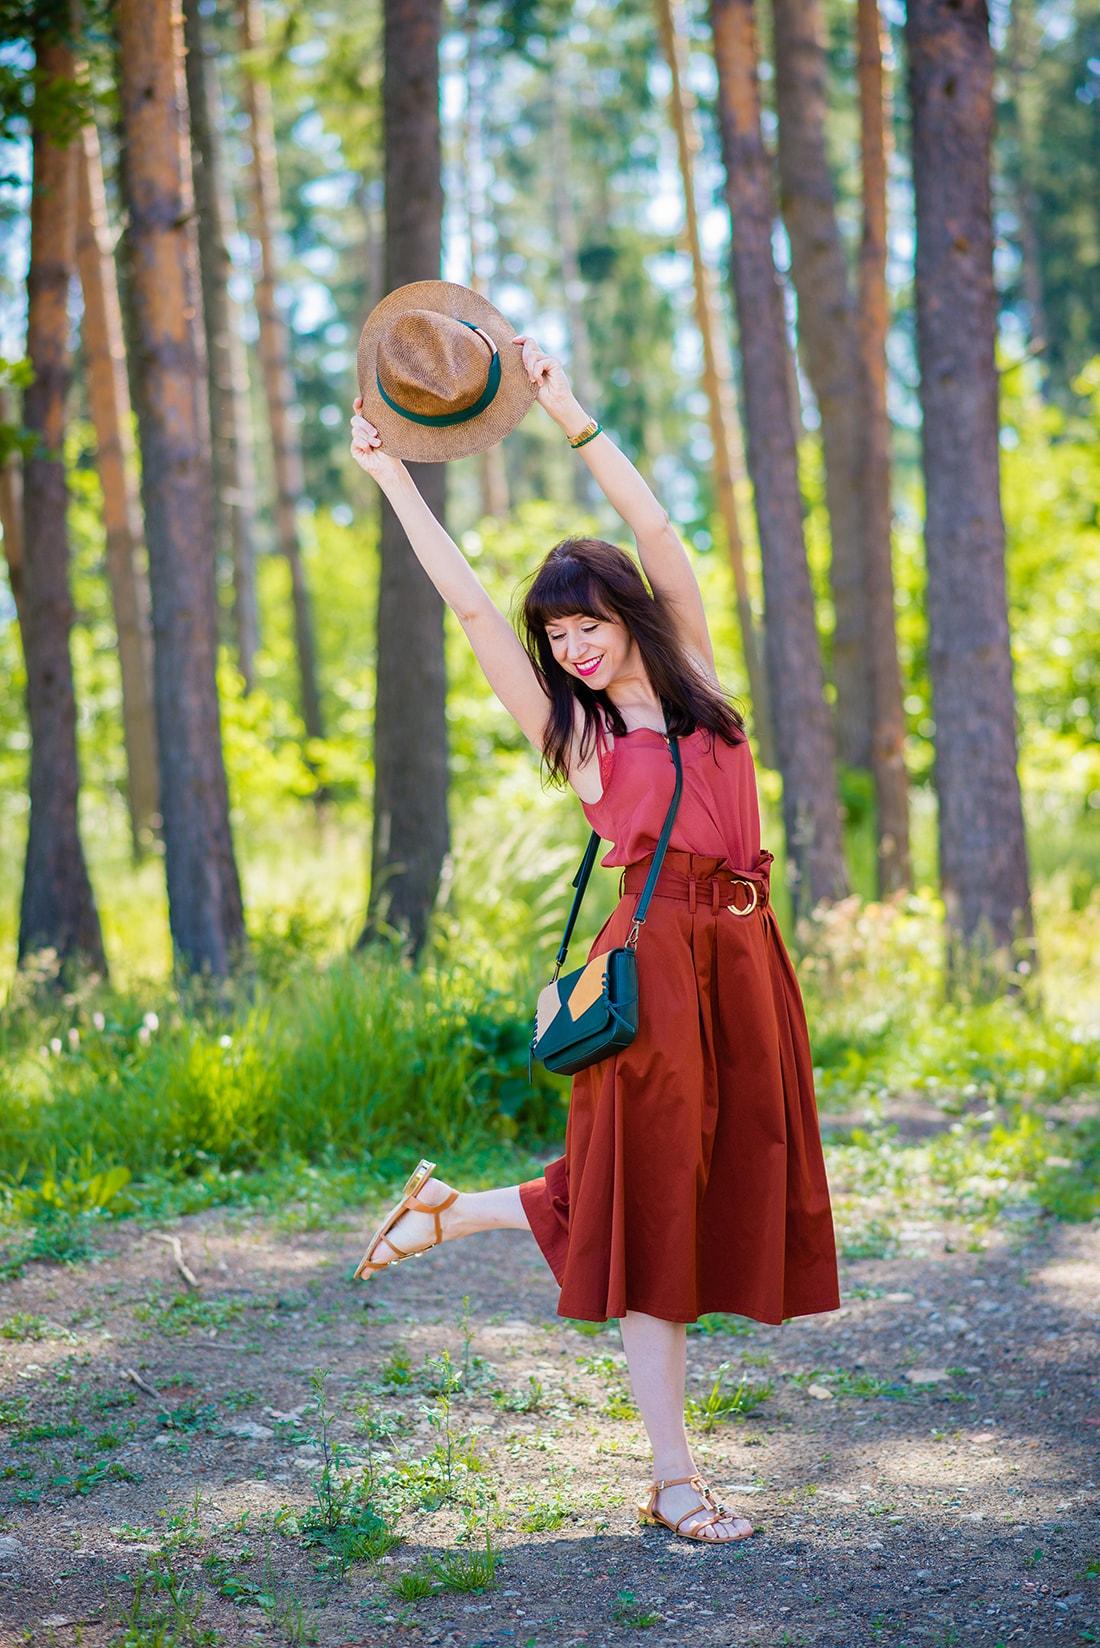 KEĎ KLOBÚK LADÍ S KABELKOU_Katharine-fashion is beautiful_blog 6_Slamený klobúk Parfois_Áčková sukňa Zara_Kabelka Parfois_Katarína Jakubčová_Fashion blogger